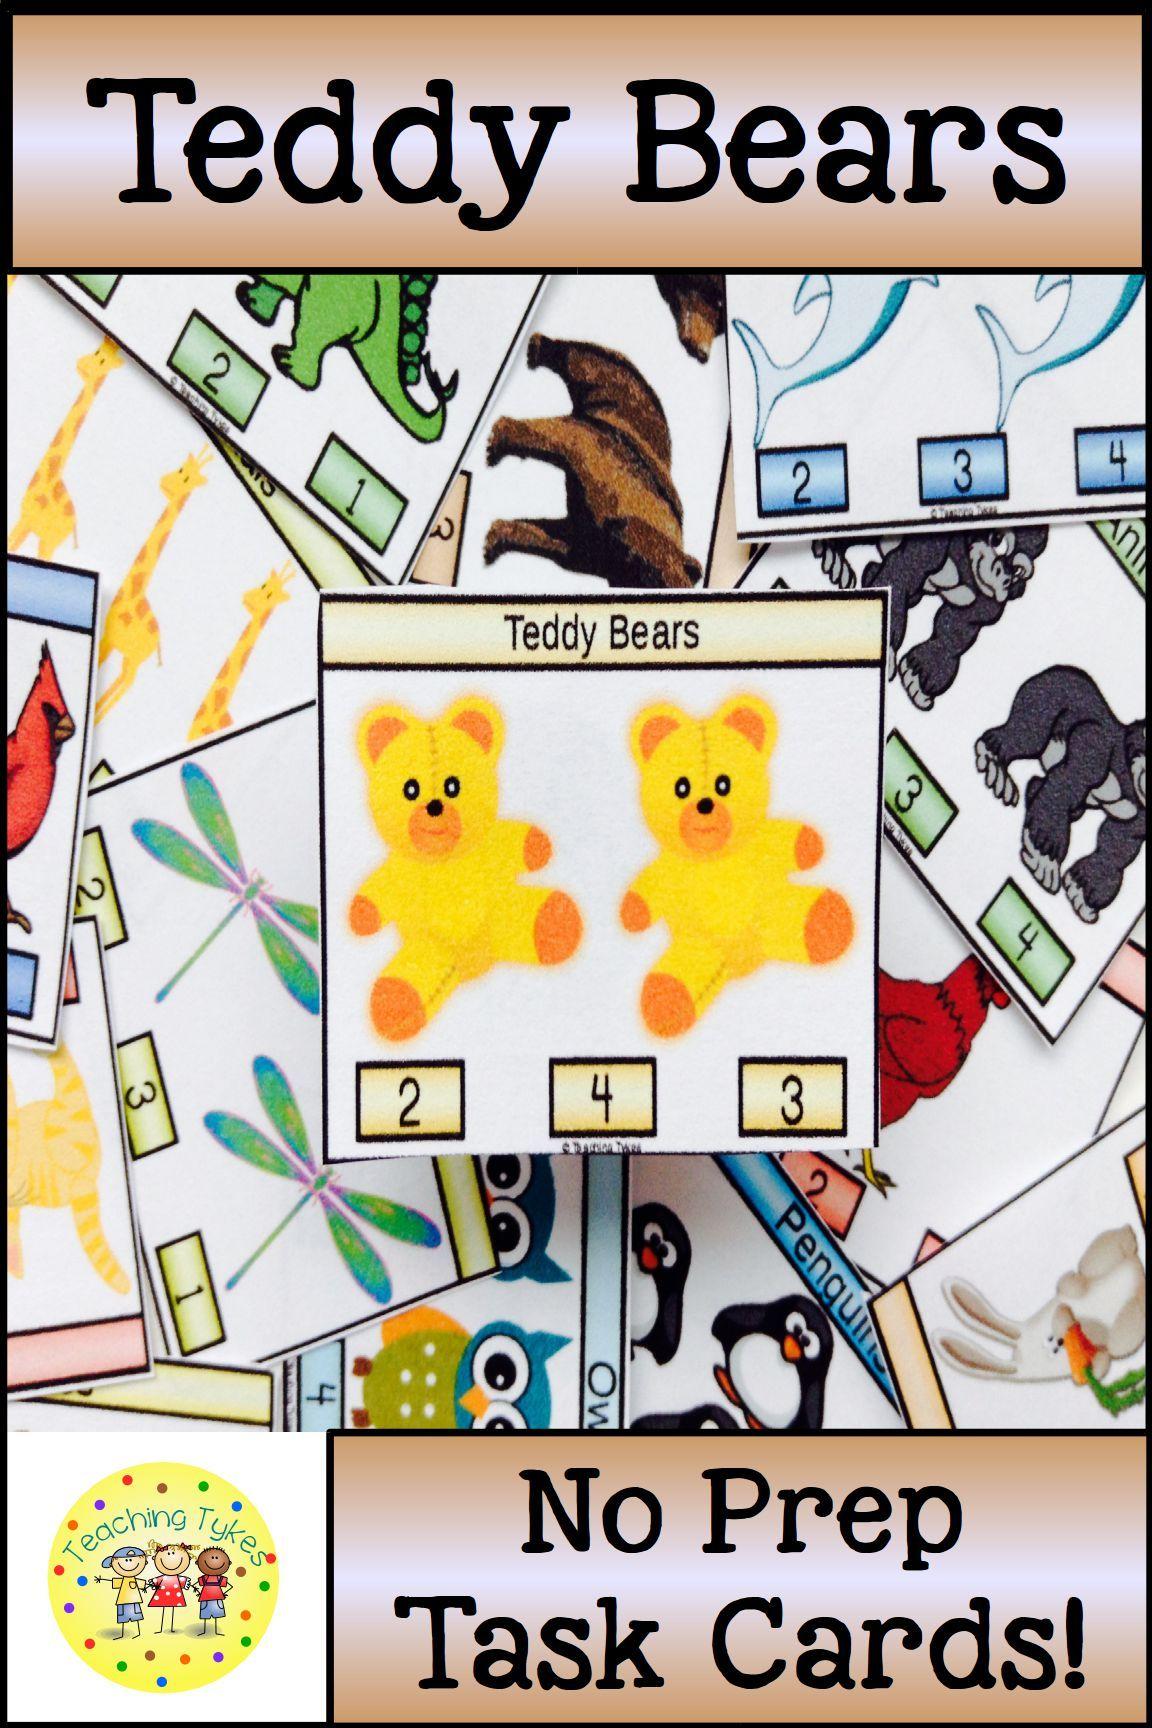 Teddy Bears Activity To Practice Counting Teddybears